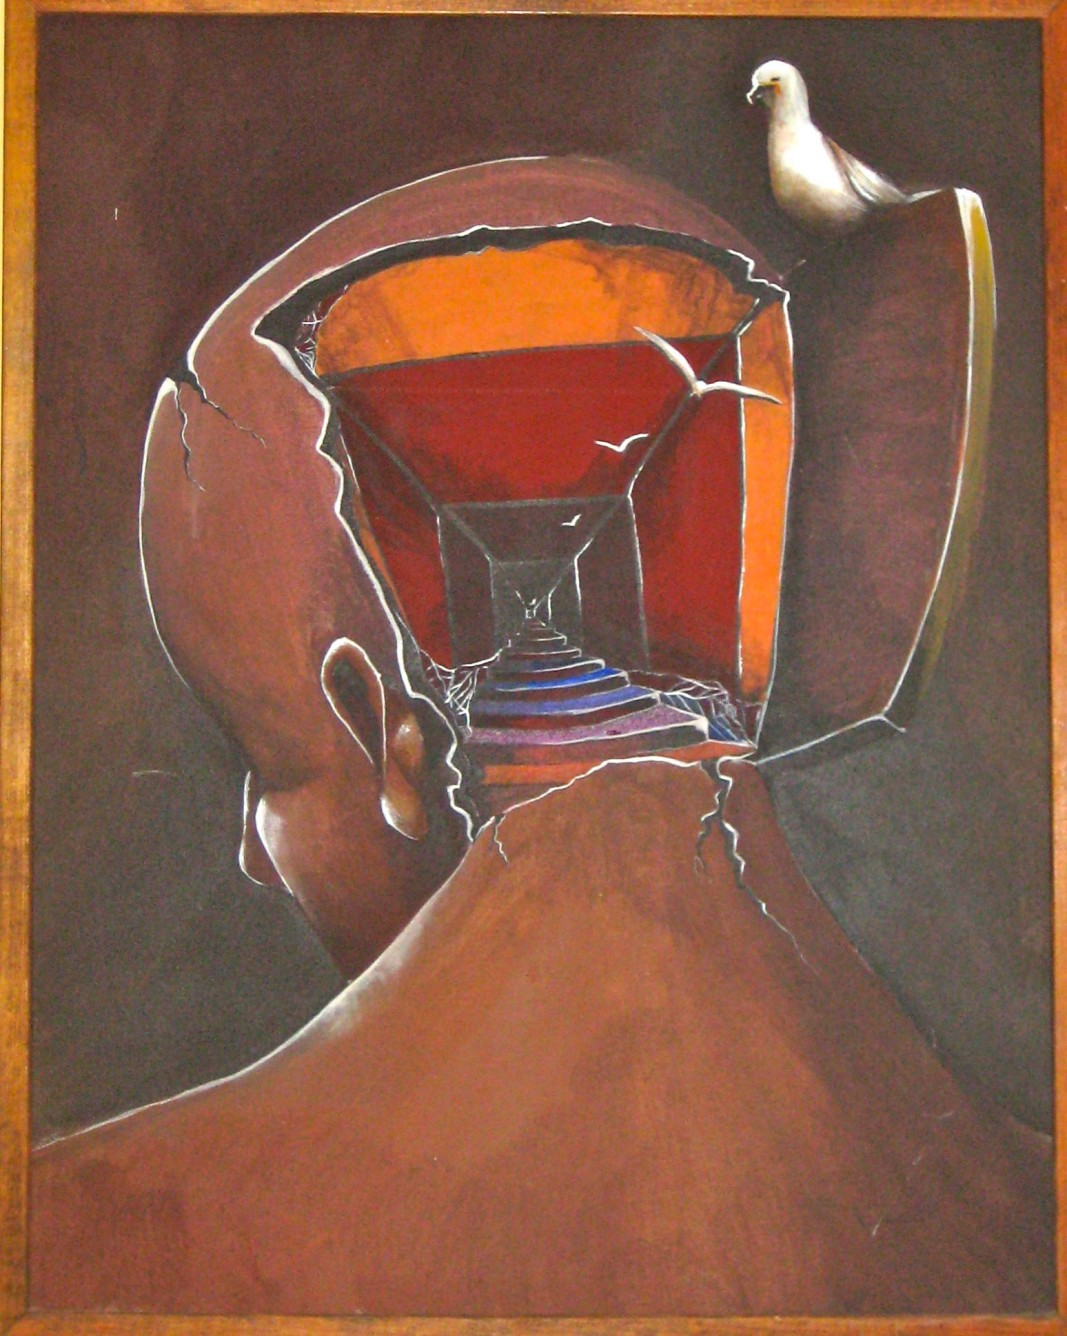 """BIRDBRAIN"", автор: L. Greselin   Снимка: Museum Of Bad Art, MOBA"